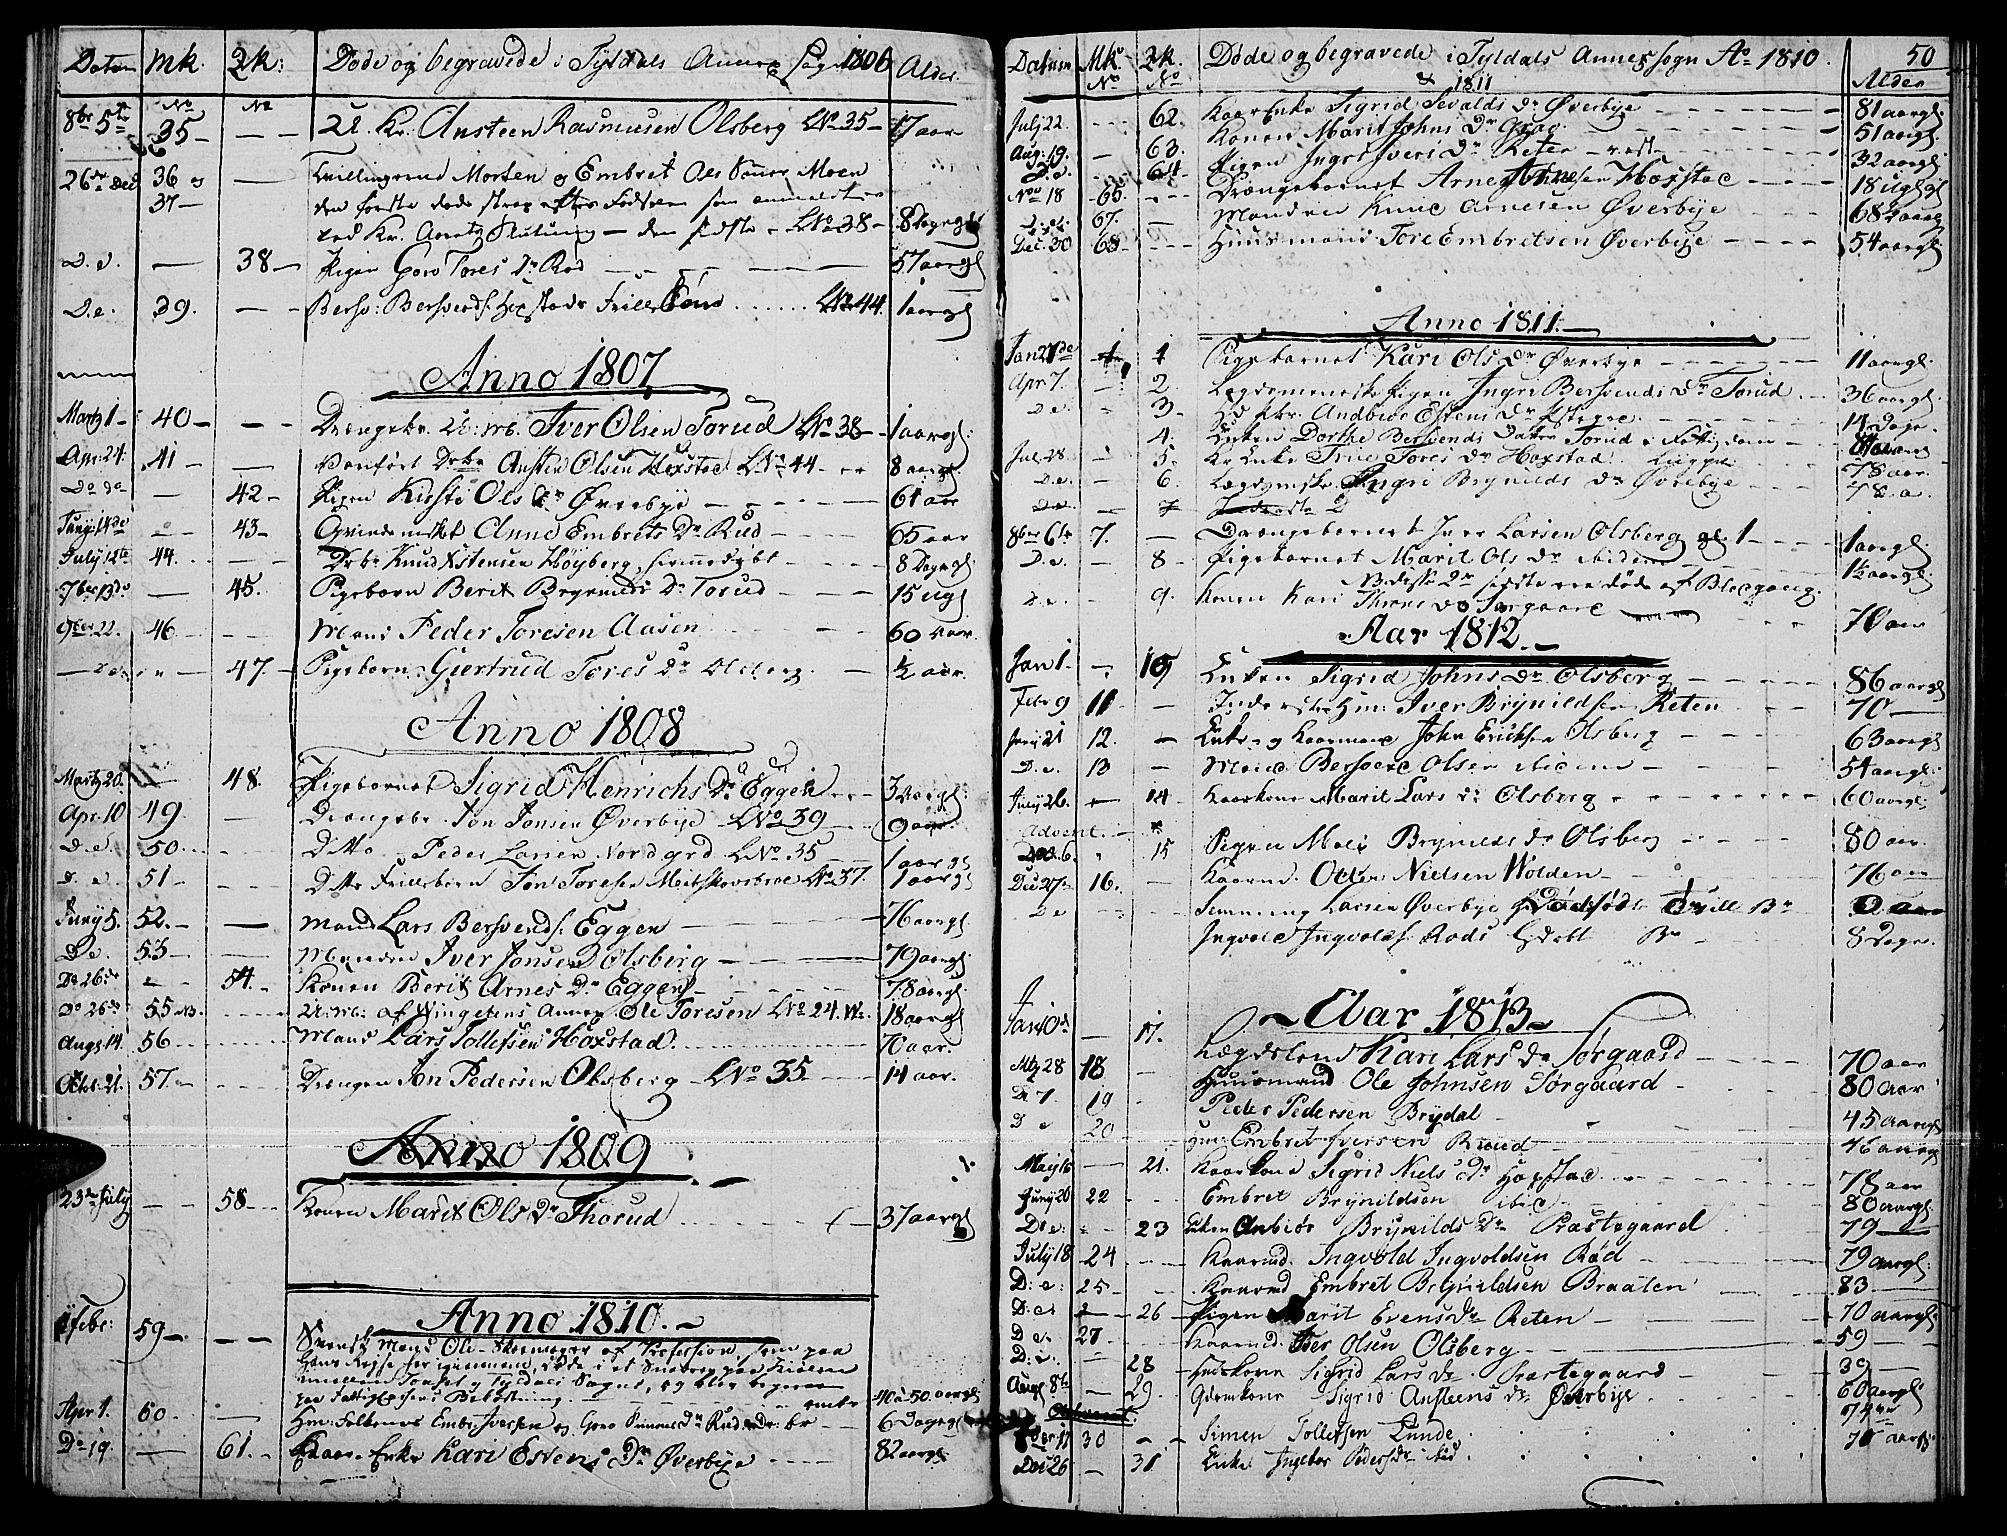 SAH, Tynset prestekontor, Ministerialbok nr. 17, 1801-1814, s. 50